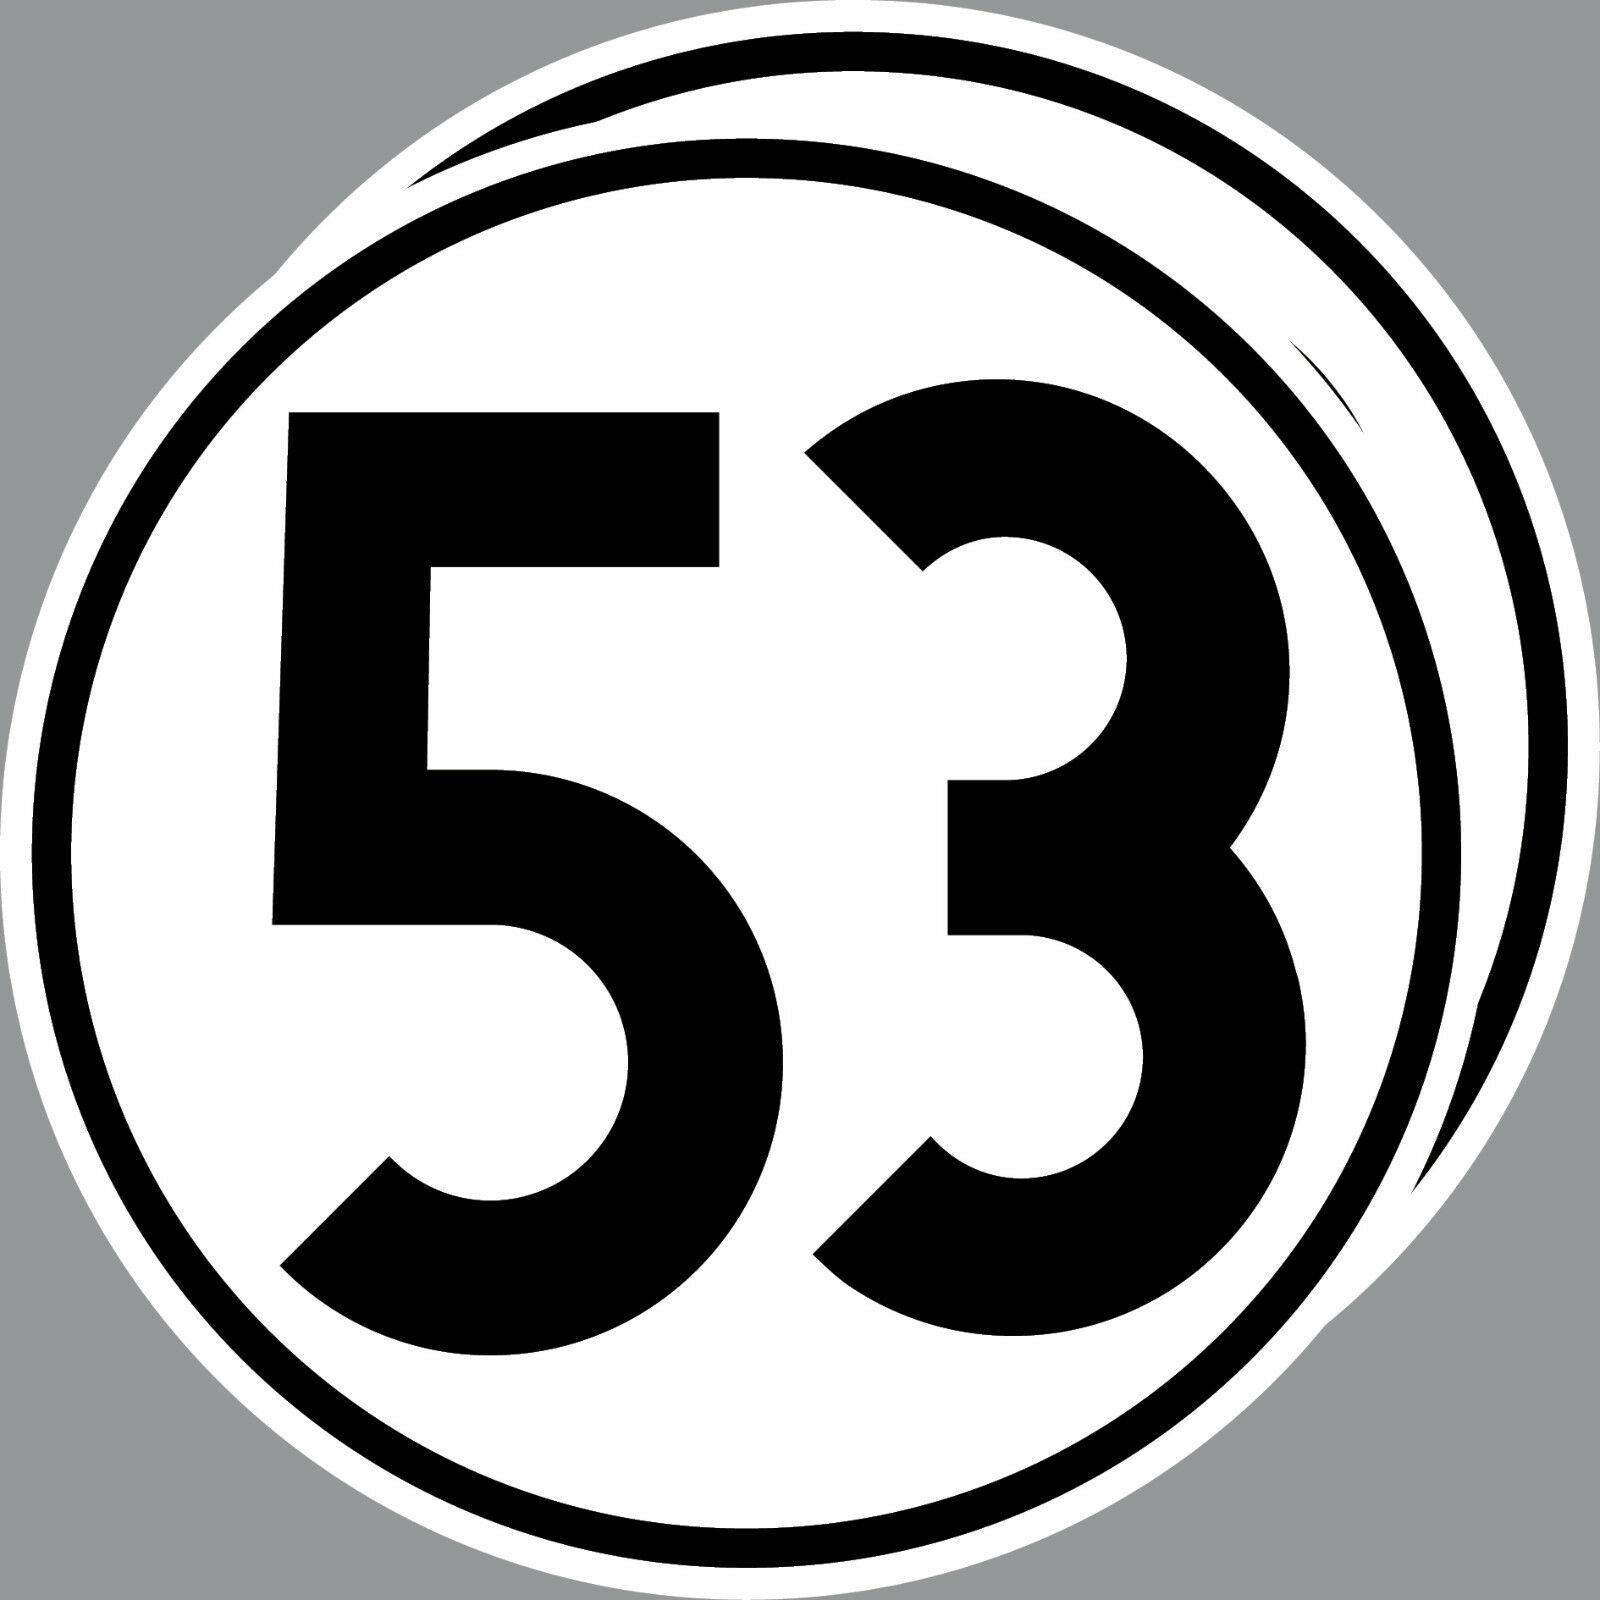 2 Aufkleber 20cm Herbie Nr 53 Start Nummer Ziffer Zahl Racing Auto Motor Sport